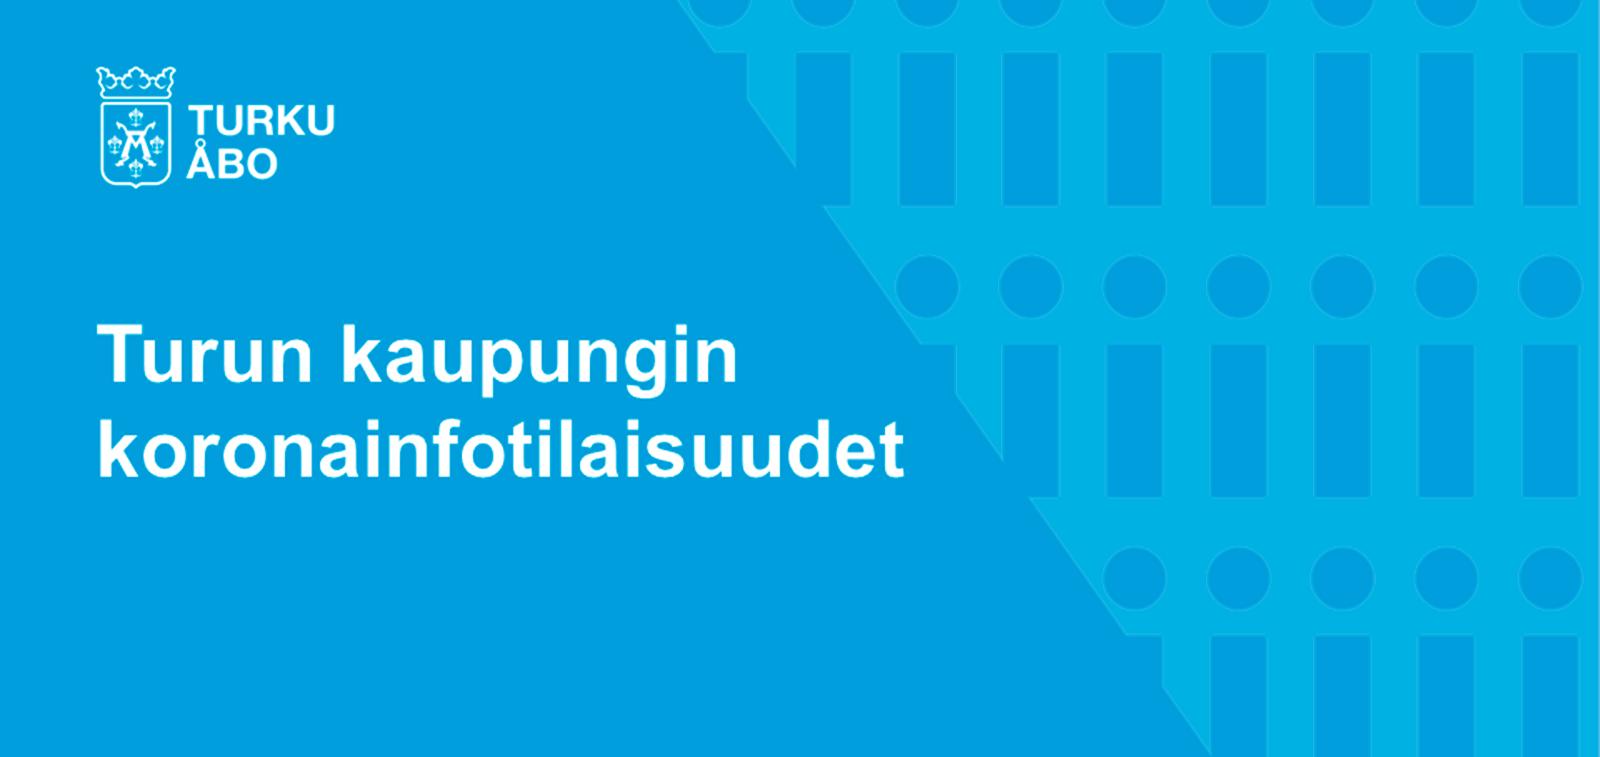 Turun kaupungin koronainfotilaisuudet